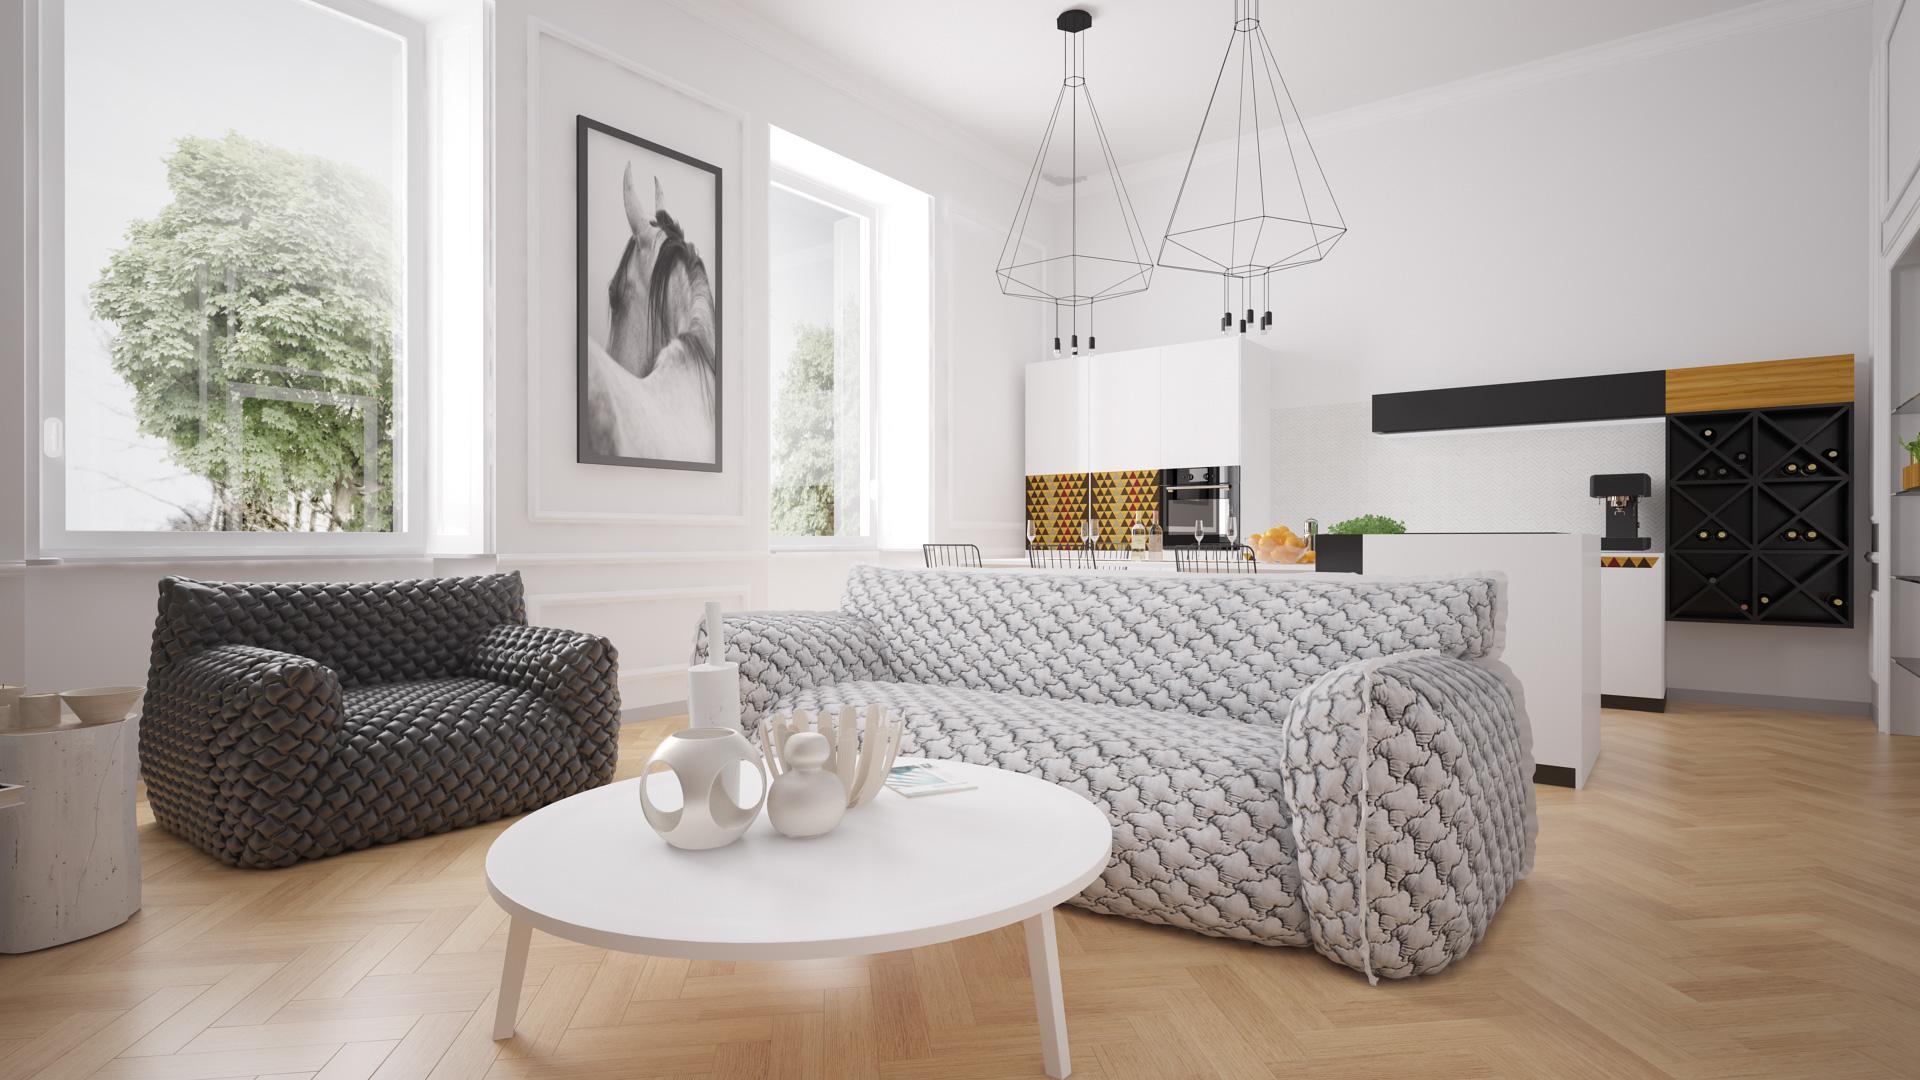 2study-interior-design-slow-wood-designboom